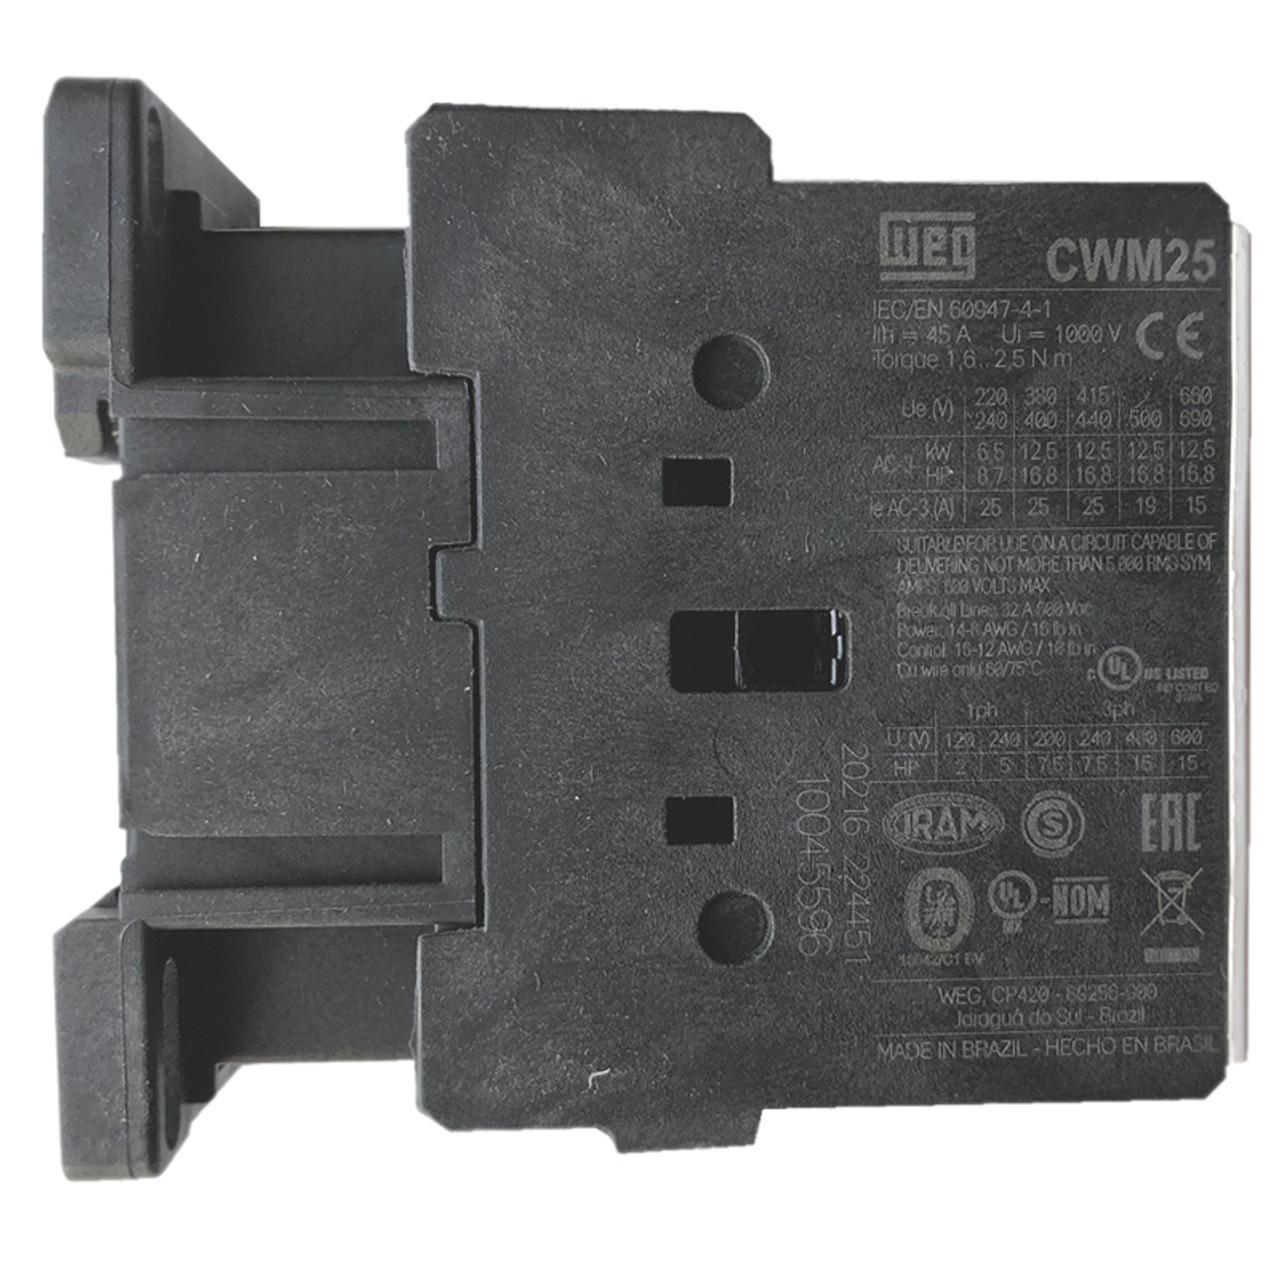 WEG CWM25-00-30V37 side label